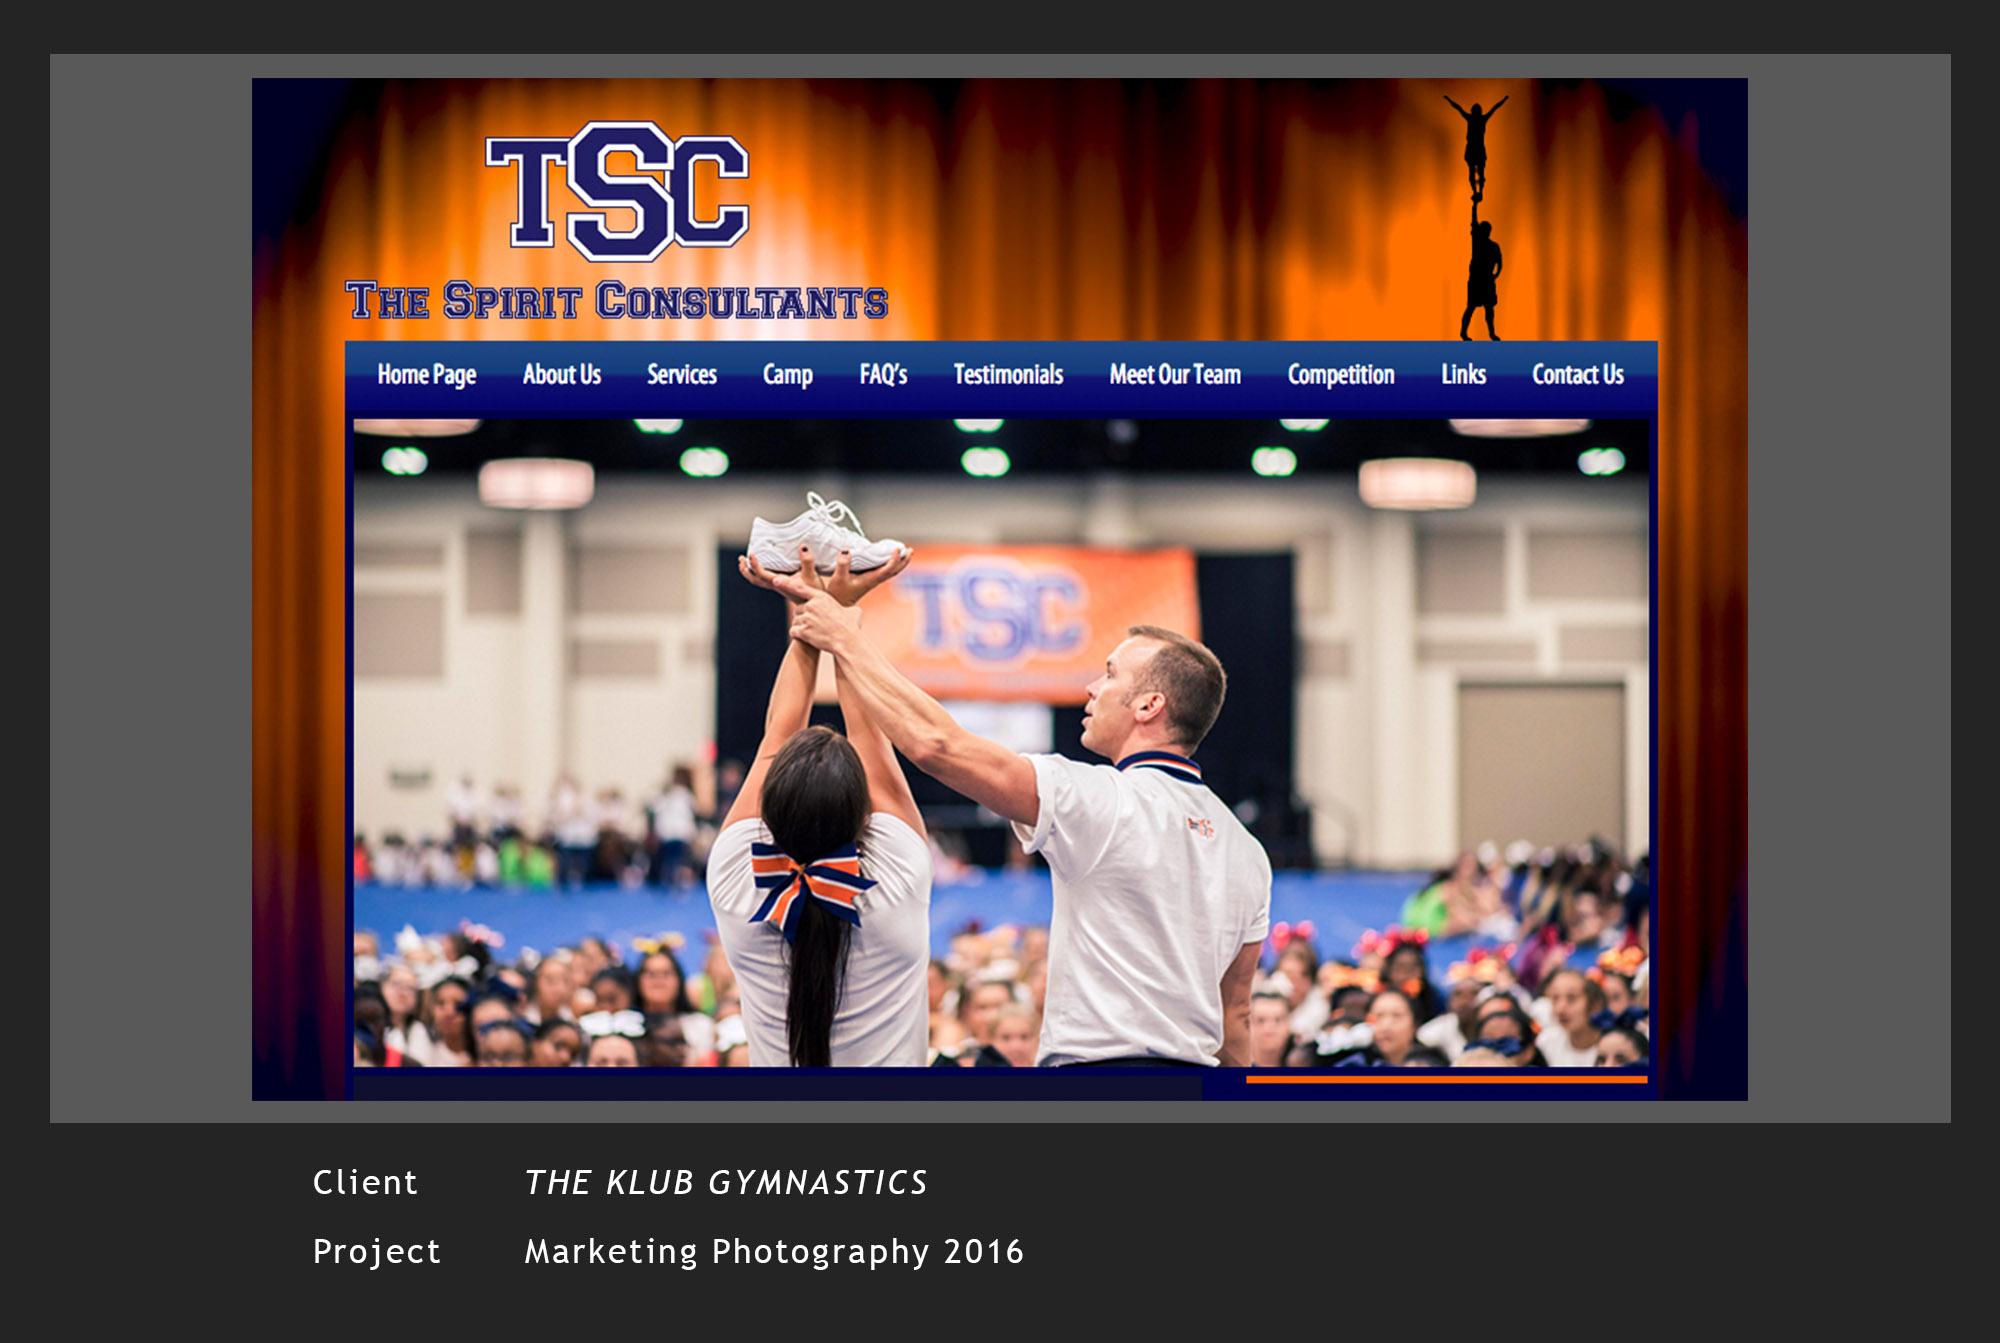 tearsheet_TSC_2016_5.jpg